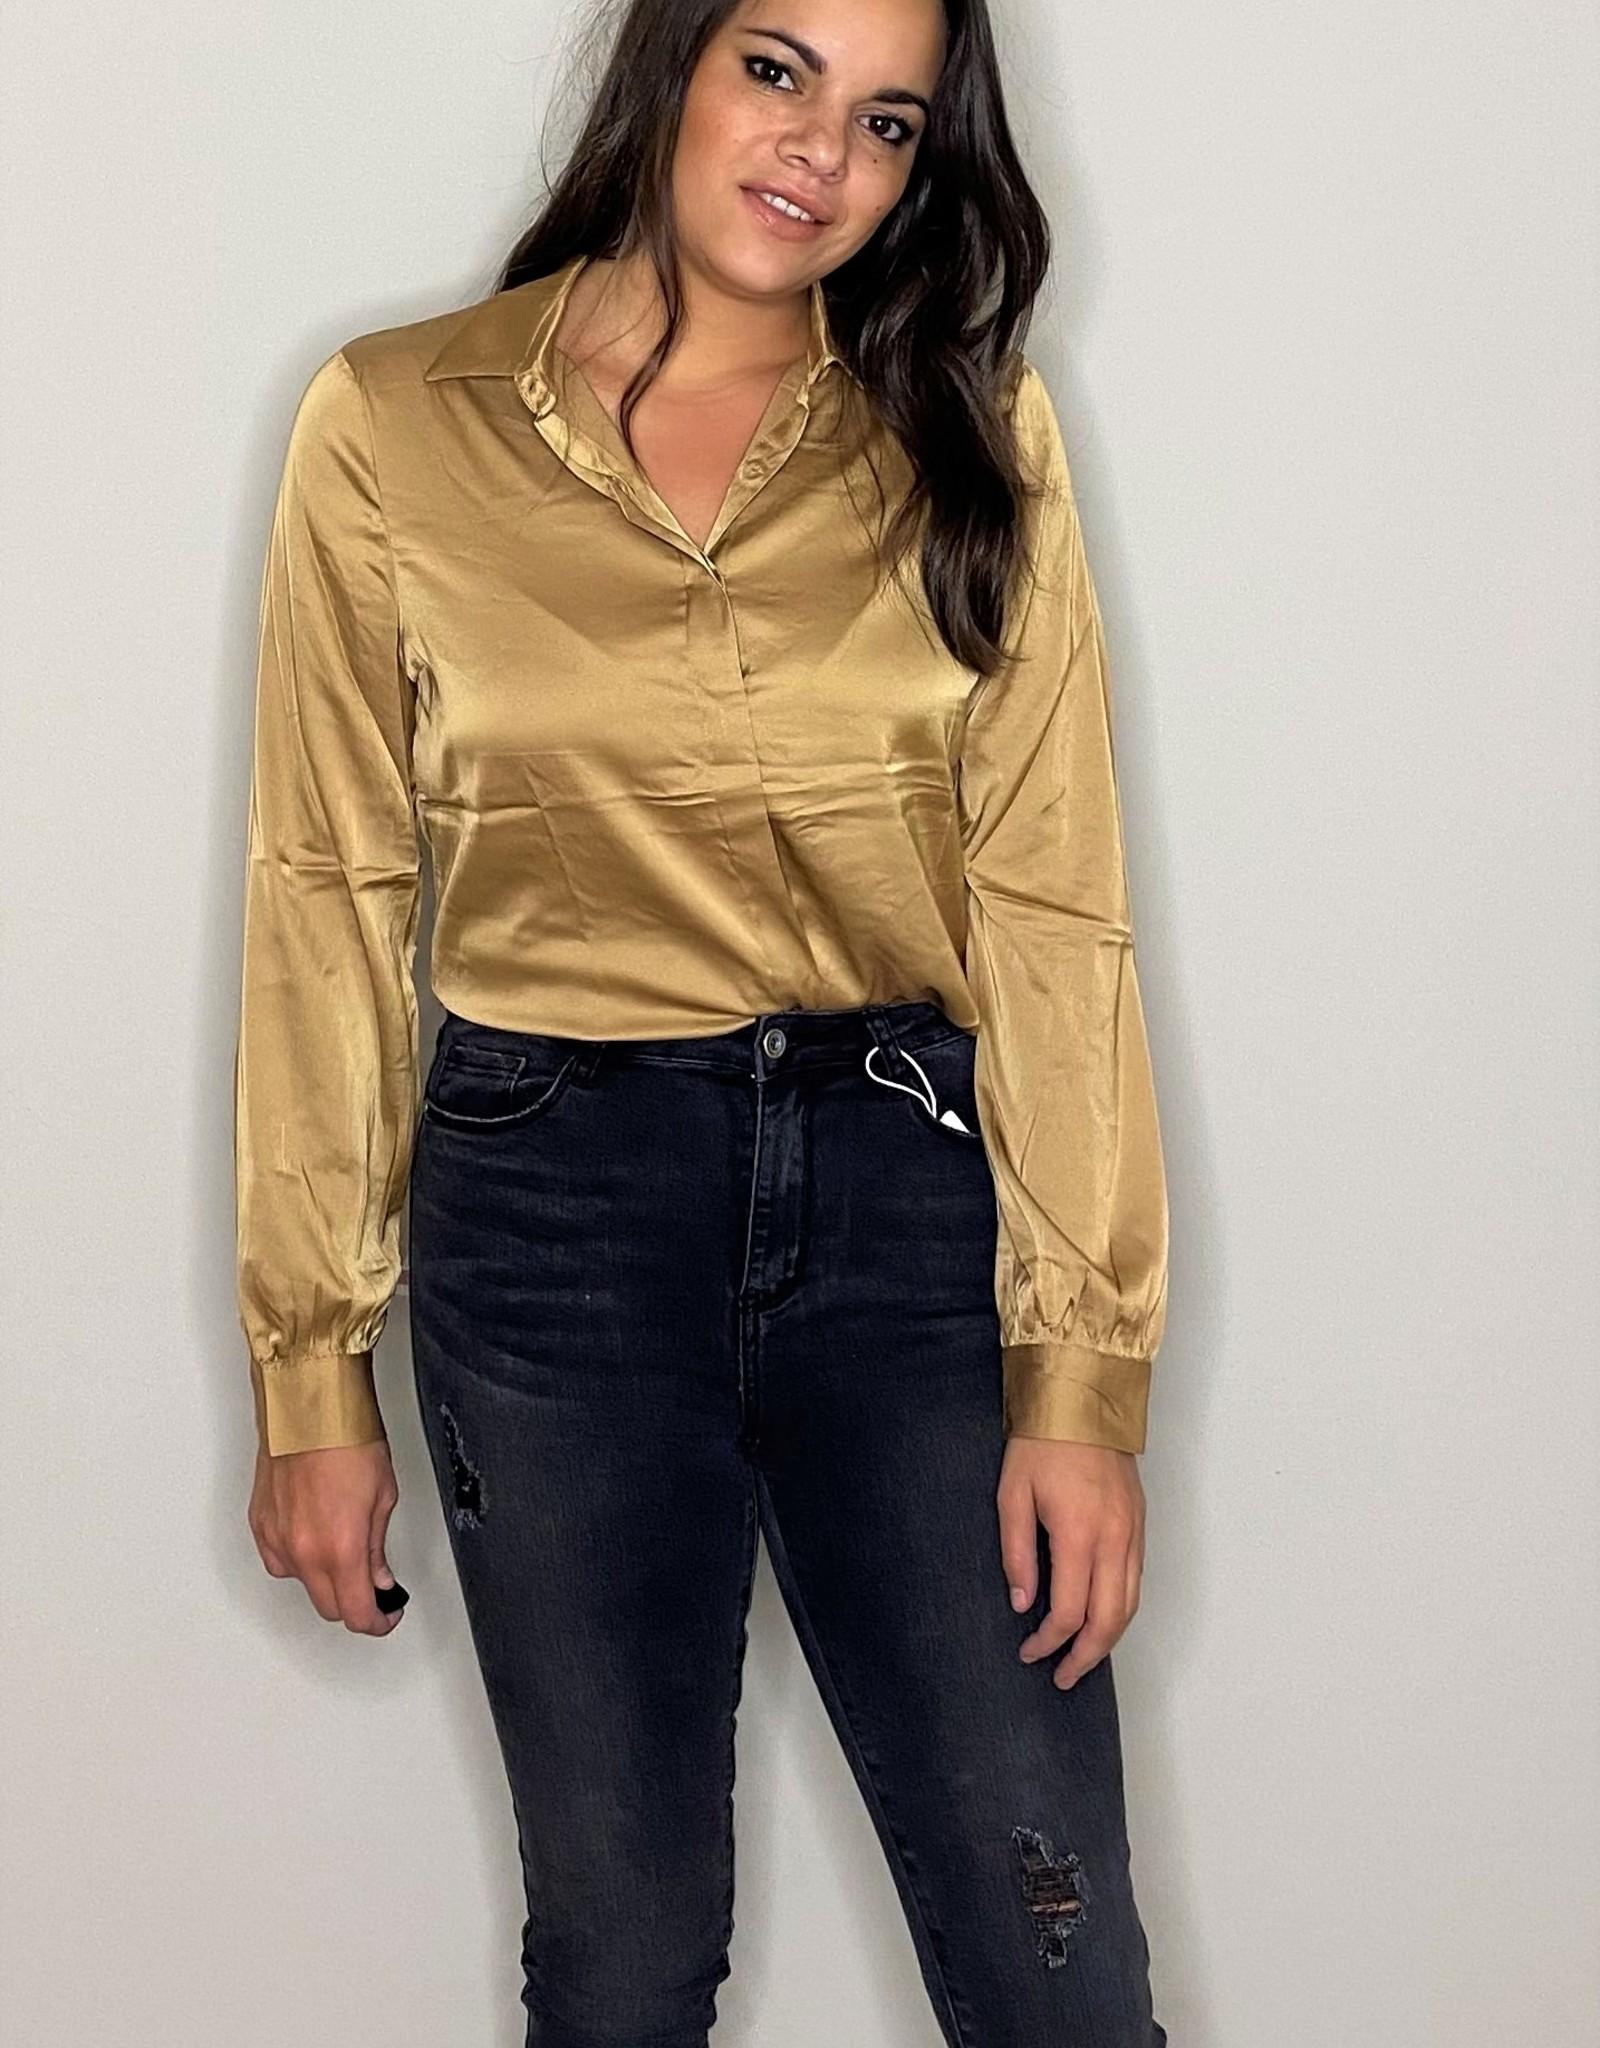 Blouse - shiny gold